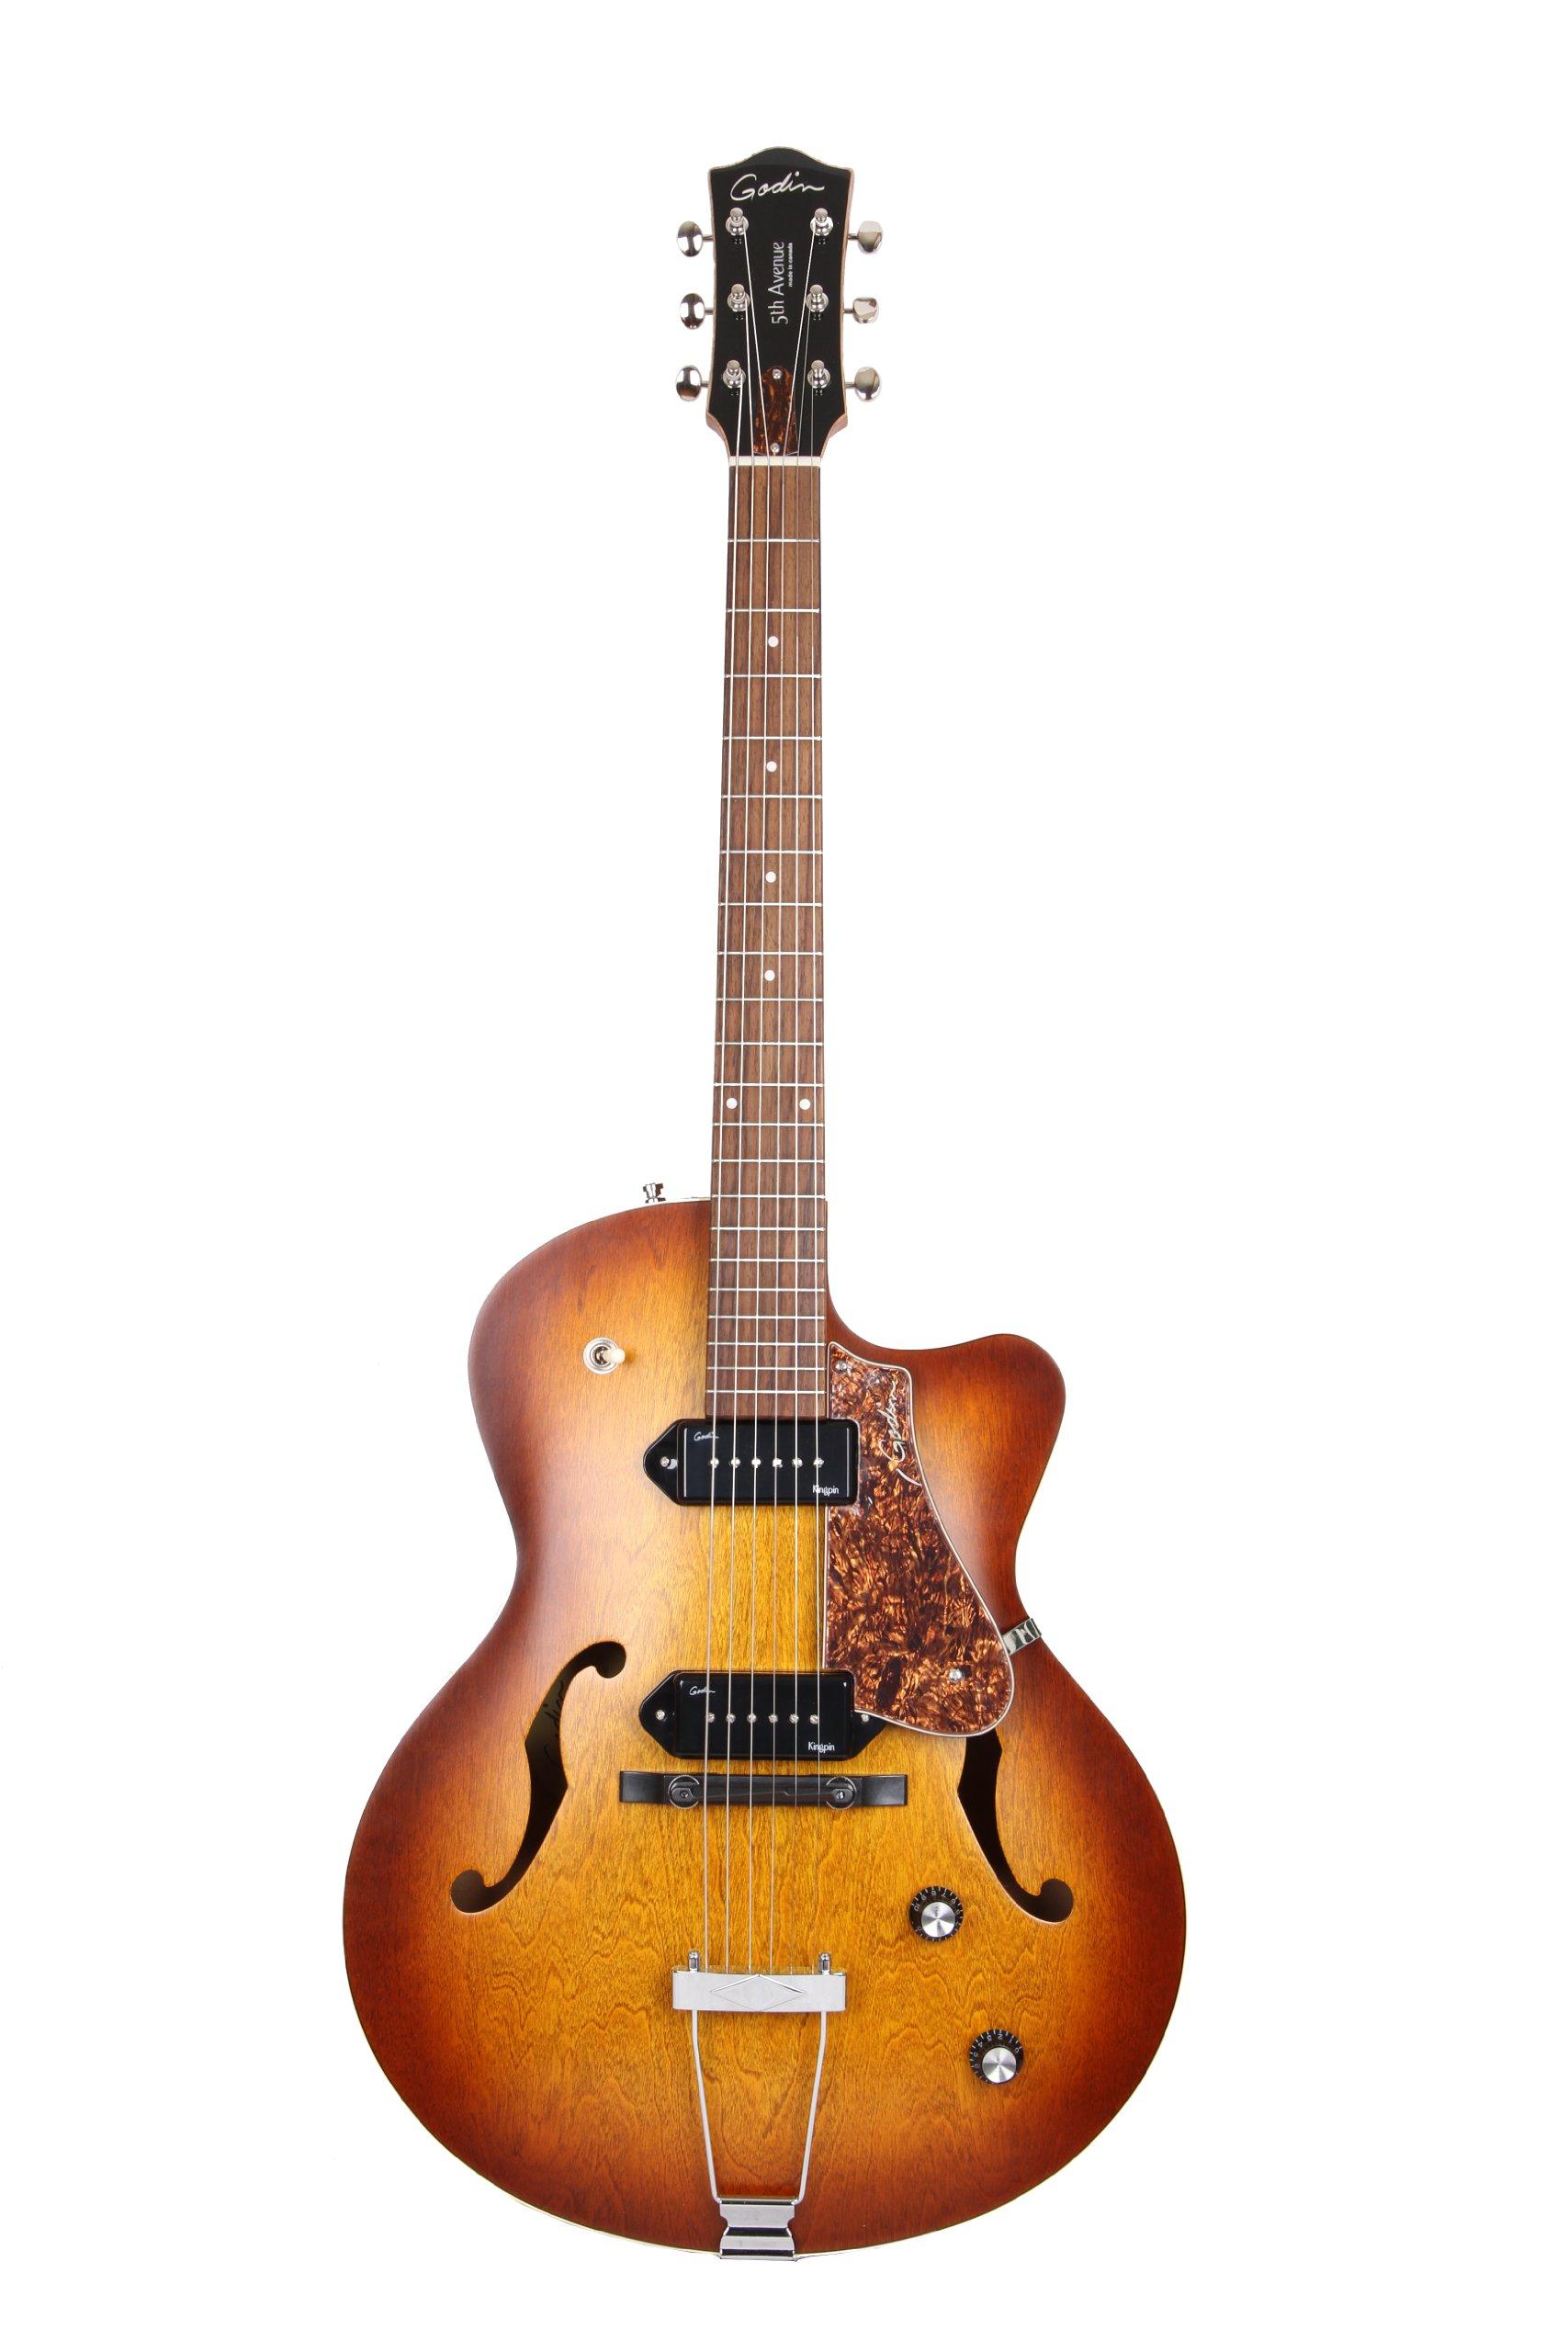 Cheap Godin 5th Avenue CW Electric Guitar (Kingpin II Cognac Burst) Black Friday & Cyber Monday 2019